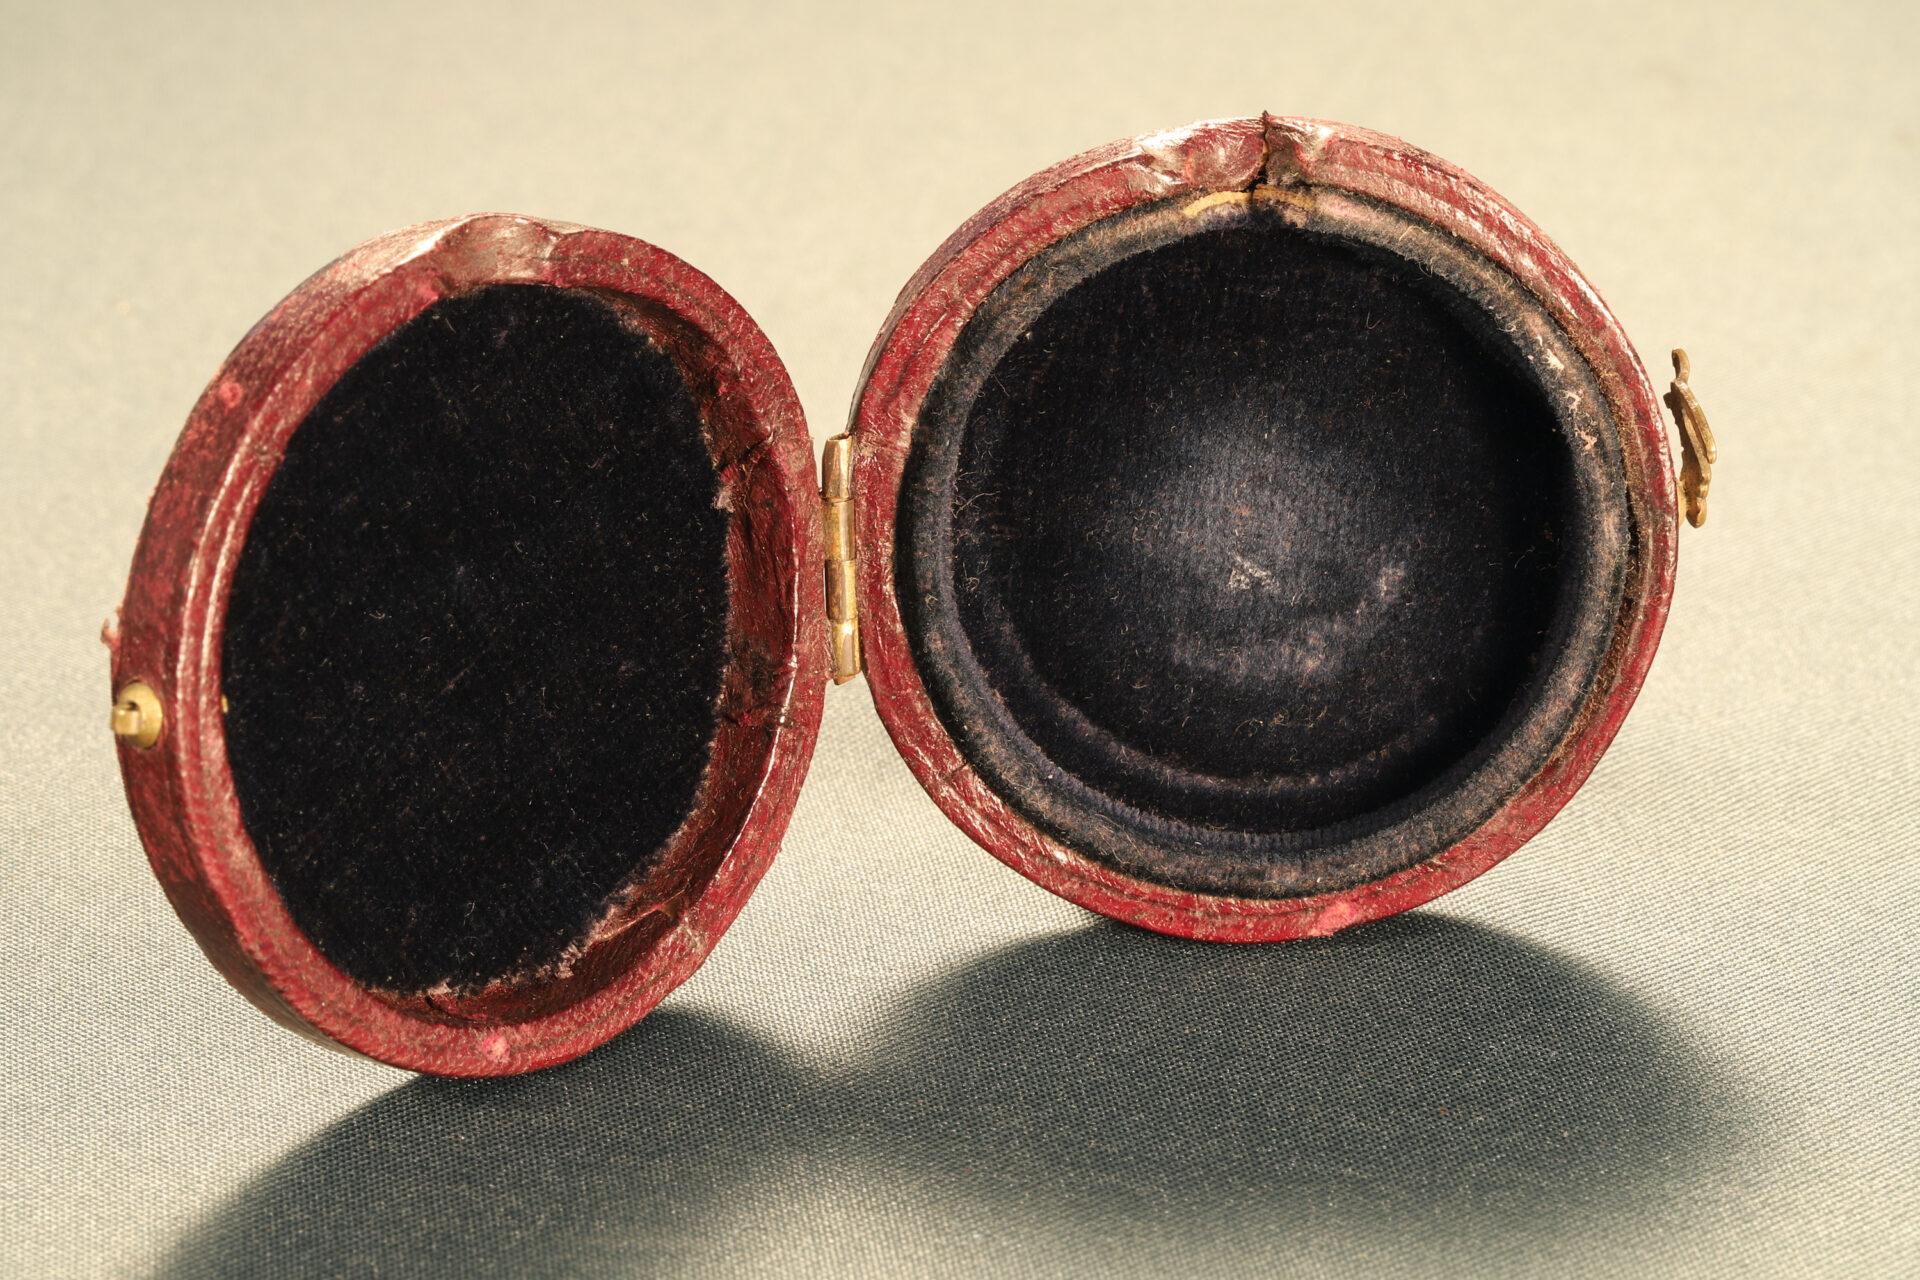 Image open travel case for Barker Radiant Transparent Pebble Lens Compass c1910